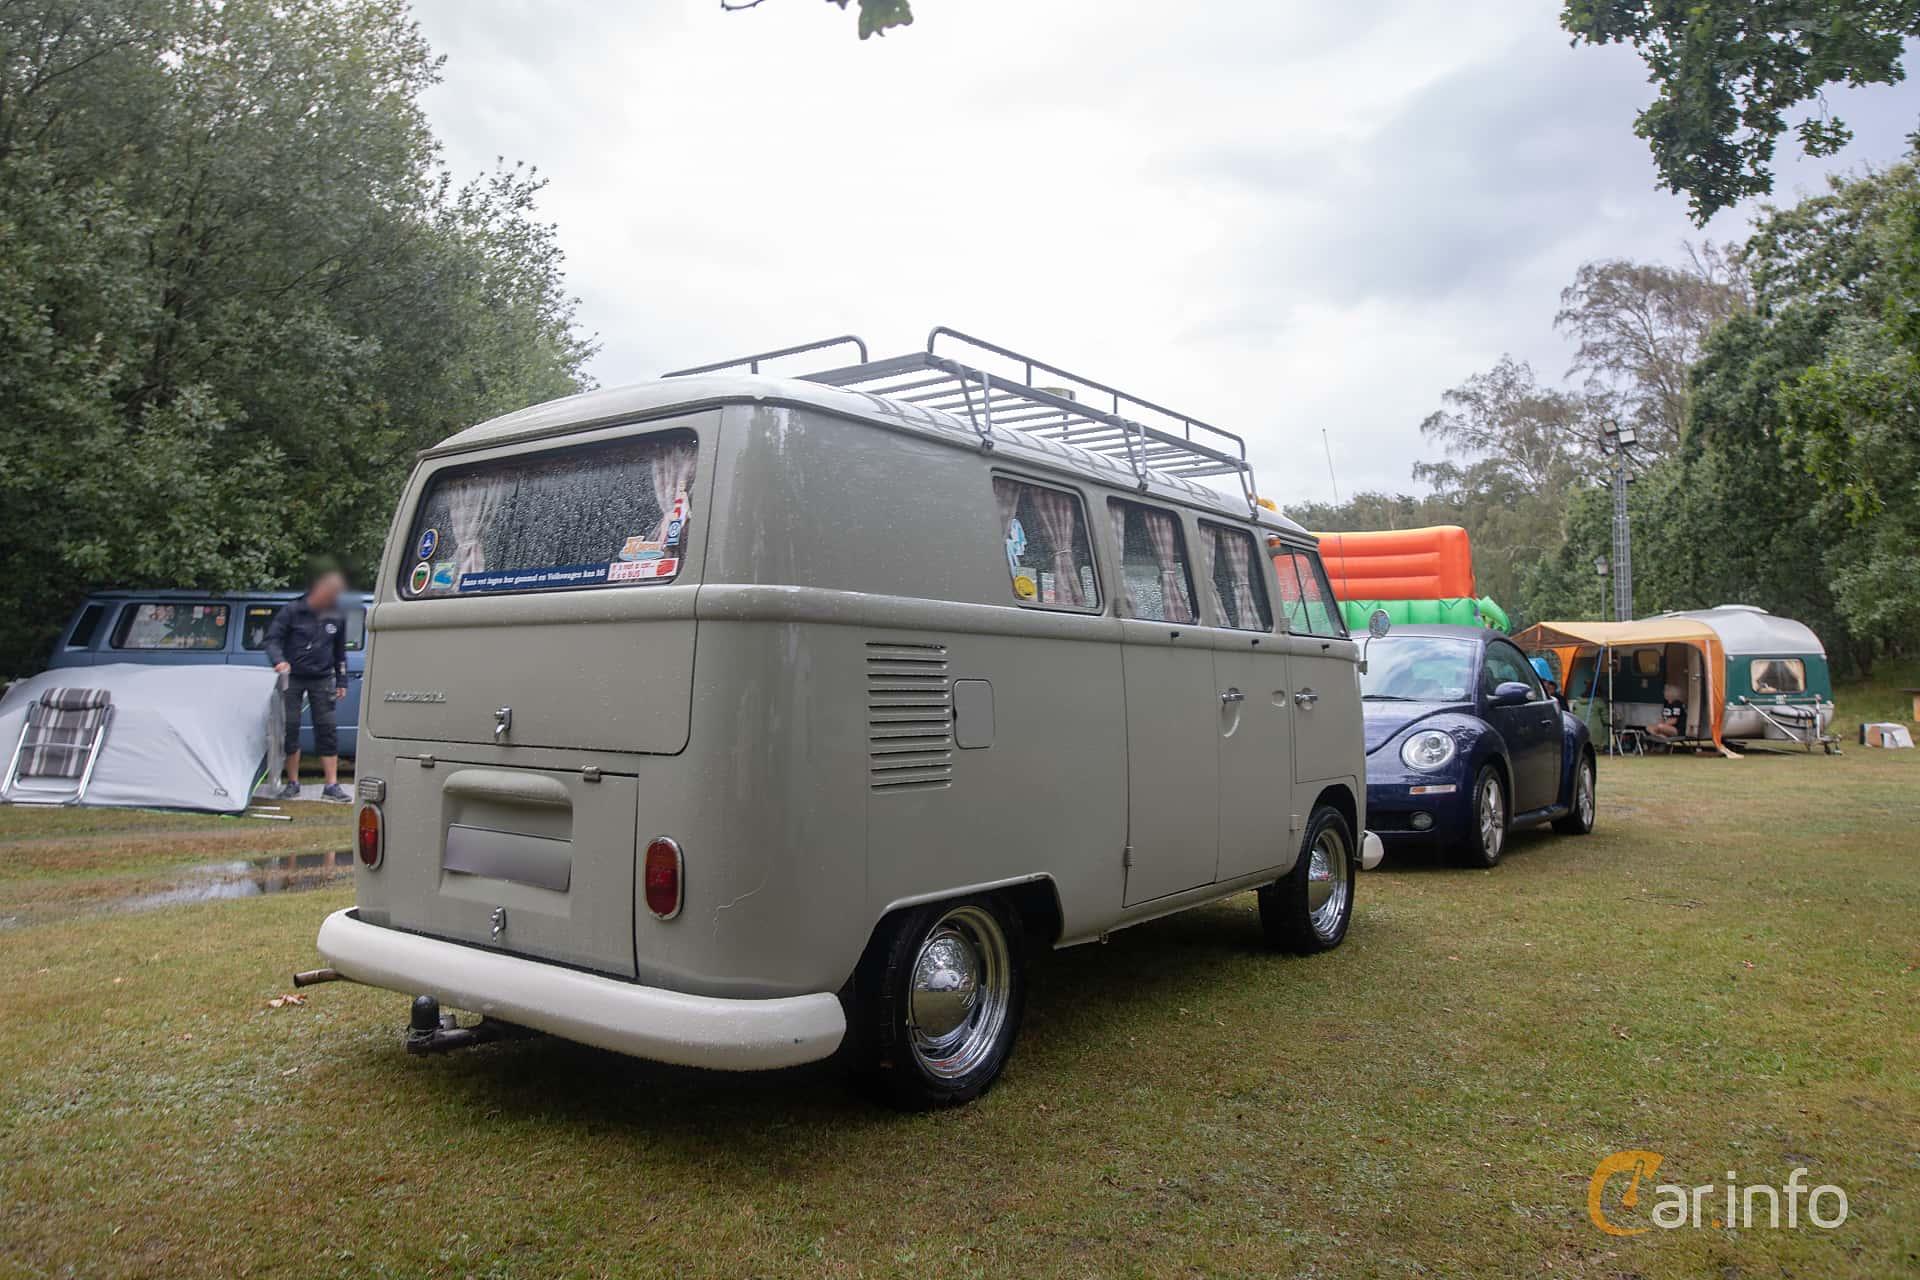 Volkswagen Transporter 1500 1.5 Manual, 44hp, 1967 at West Coast Bug Meet 2019